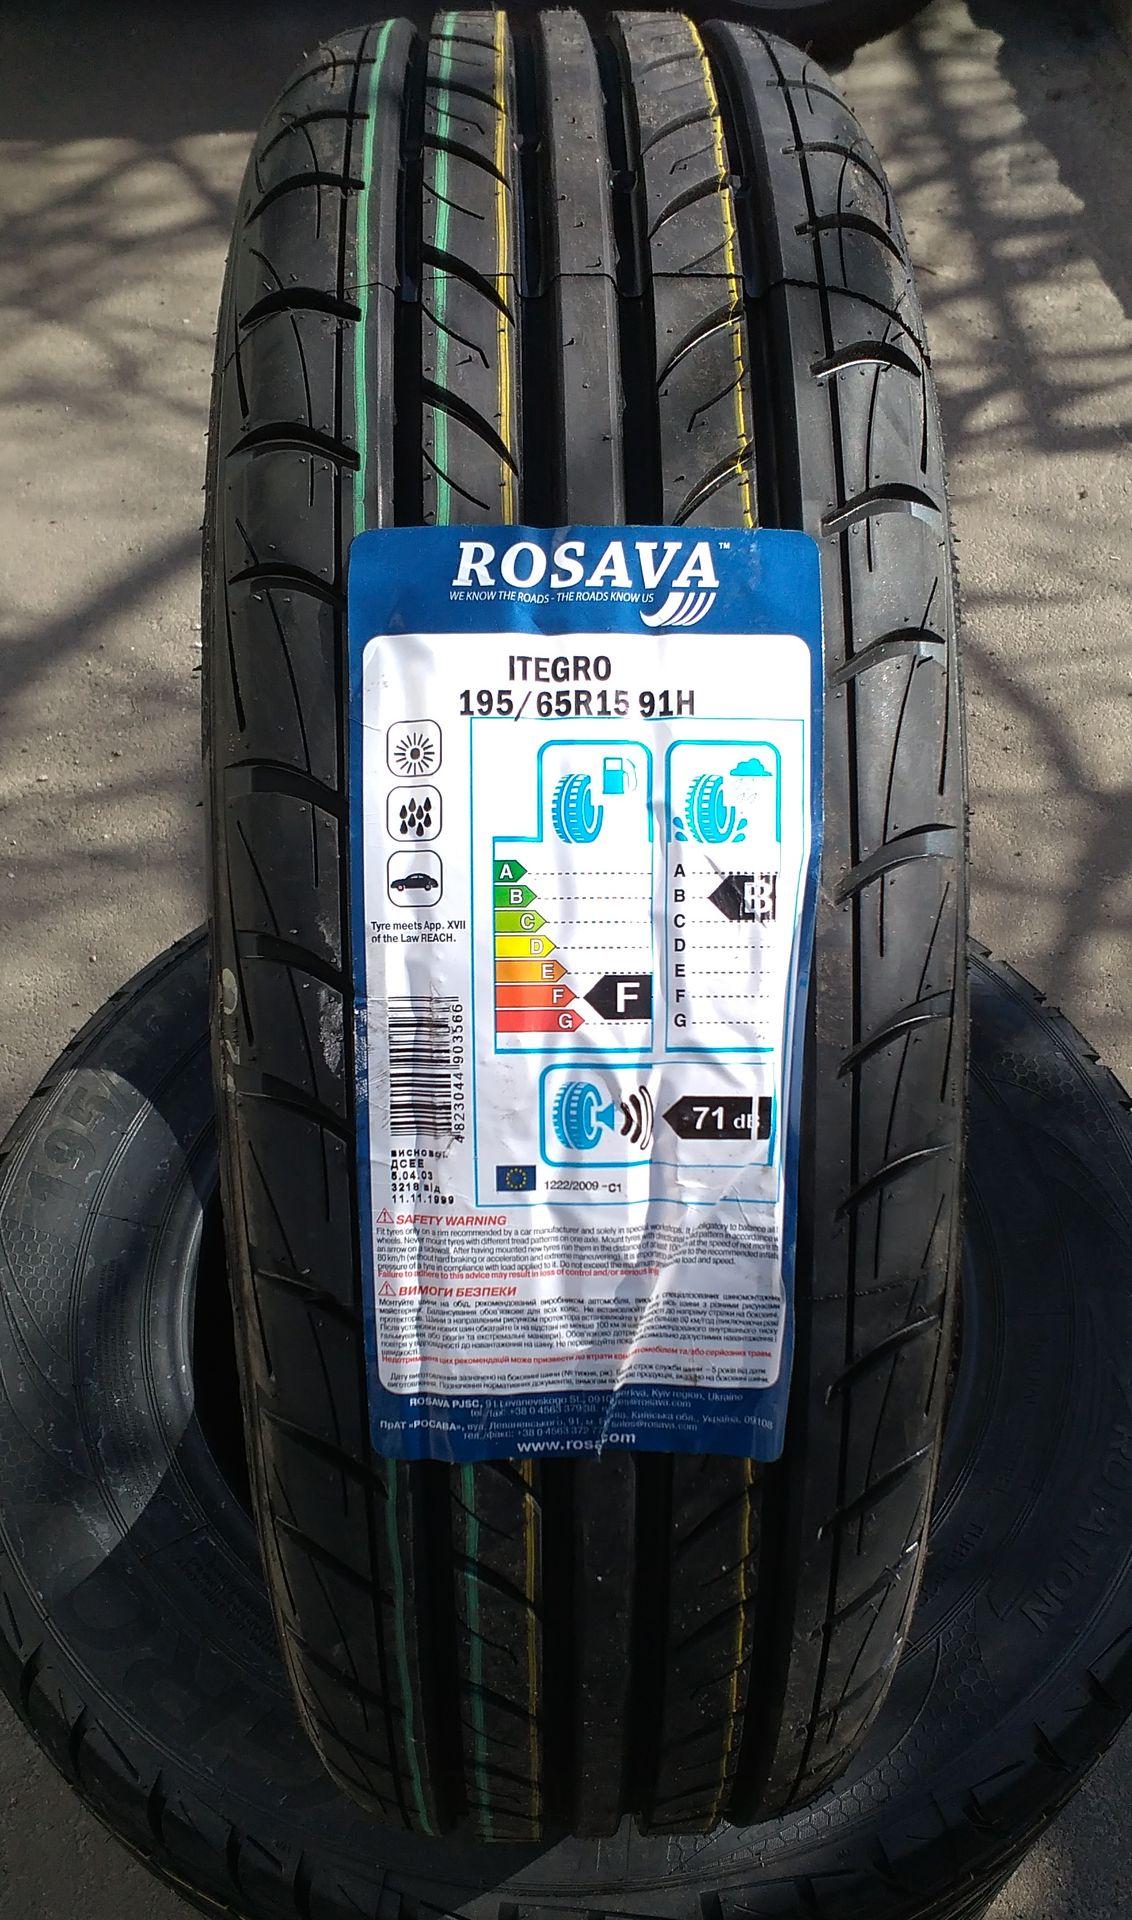 Rosava 195/65 R15